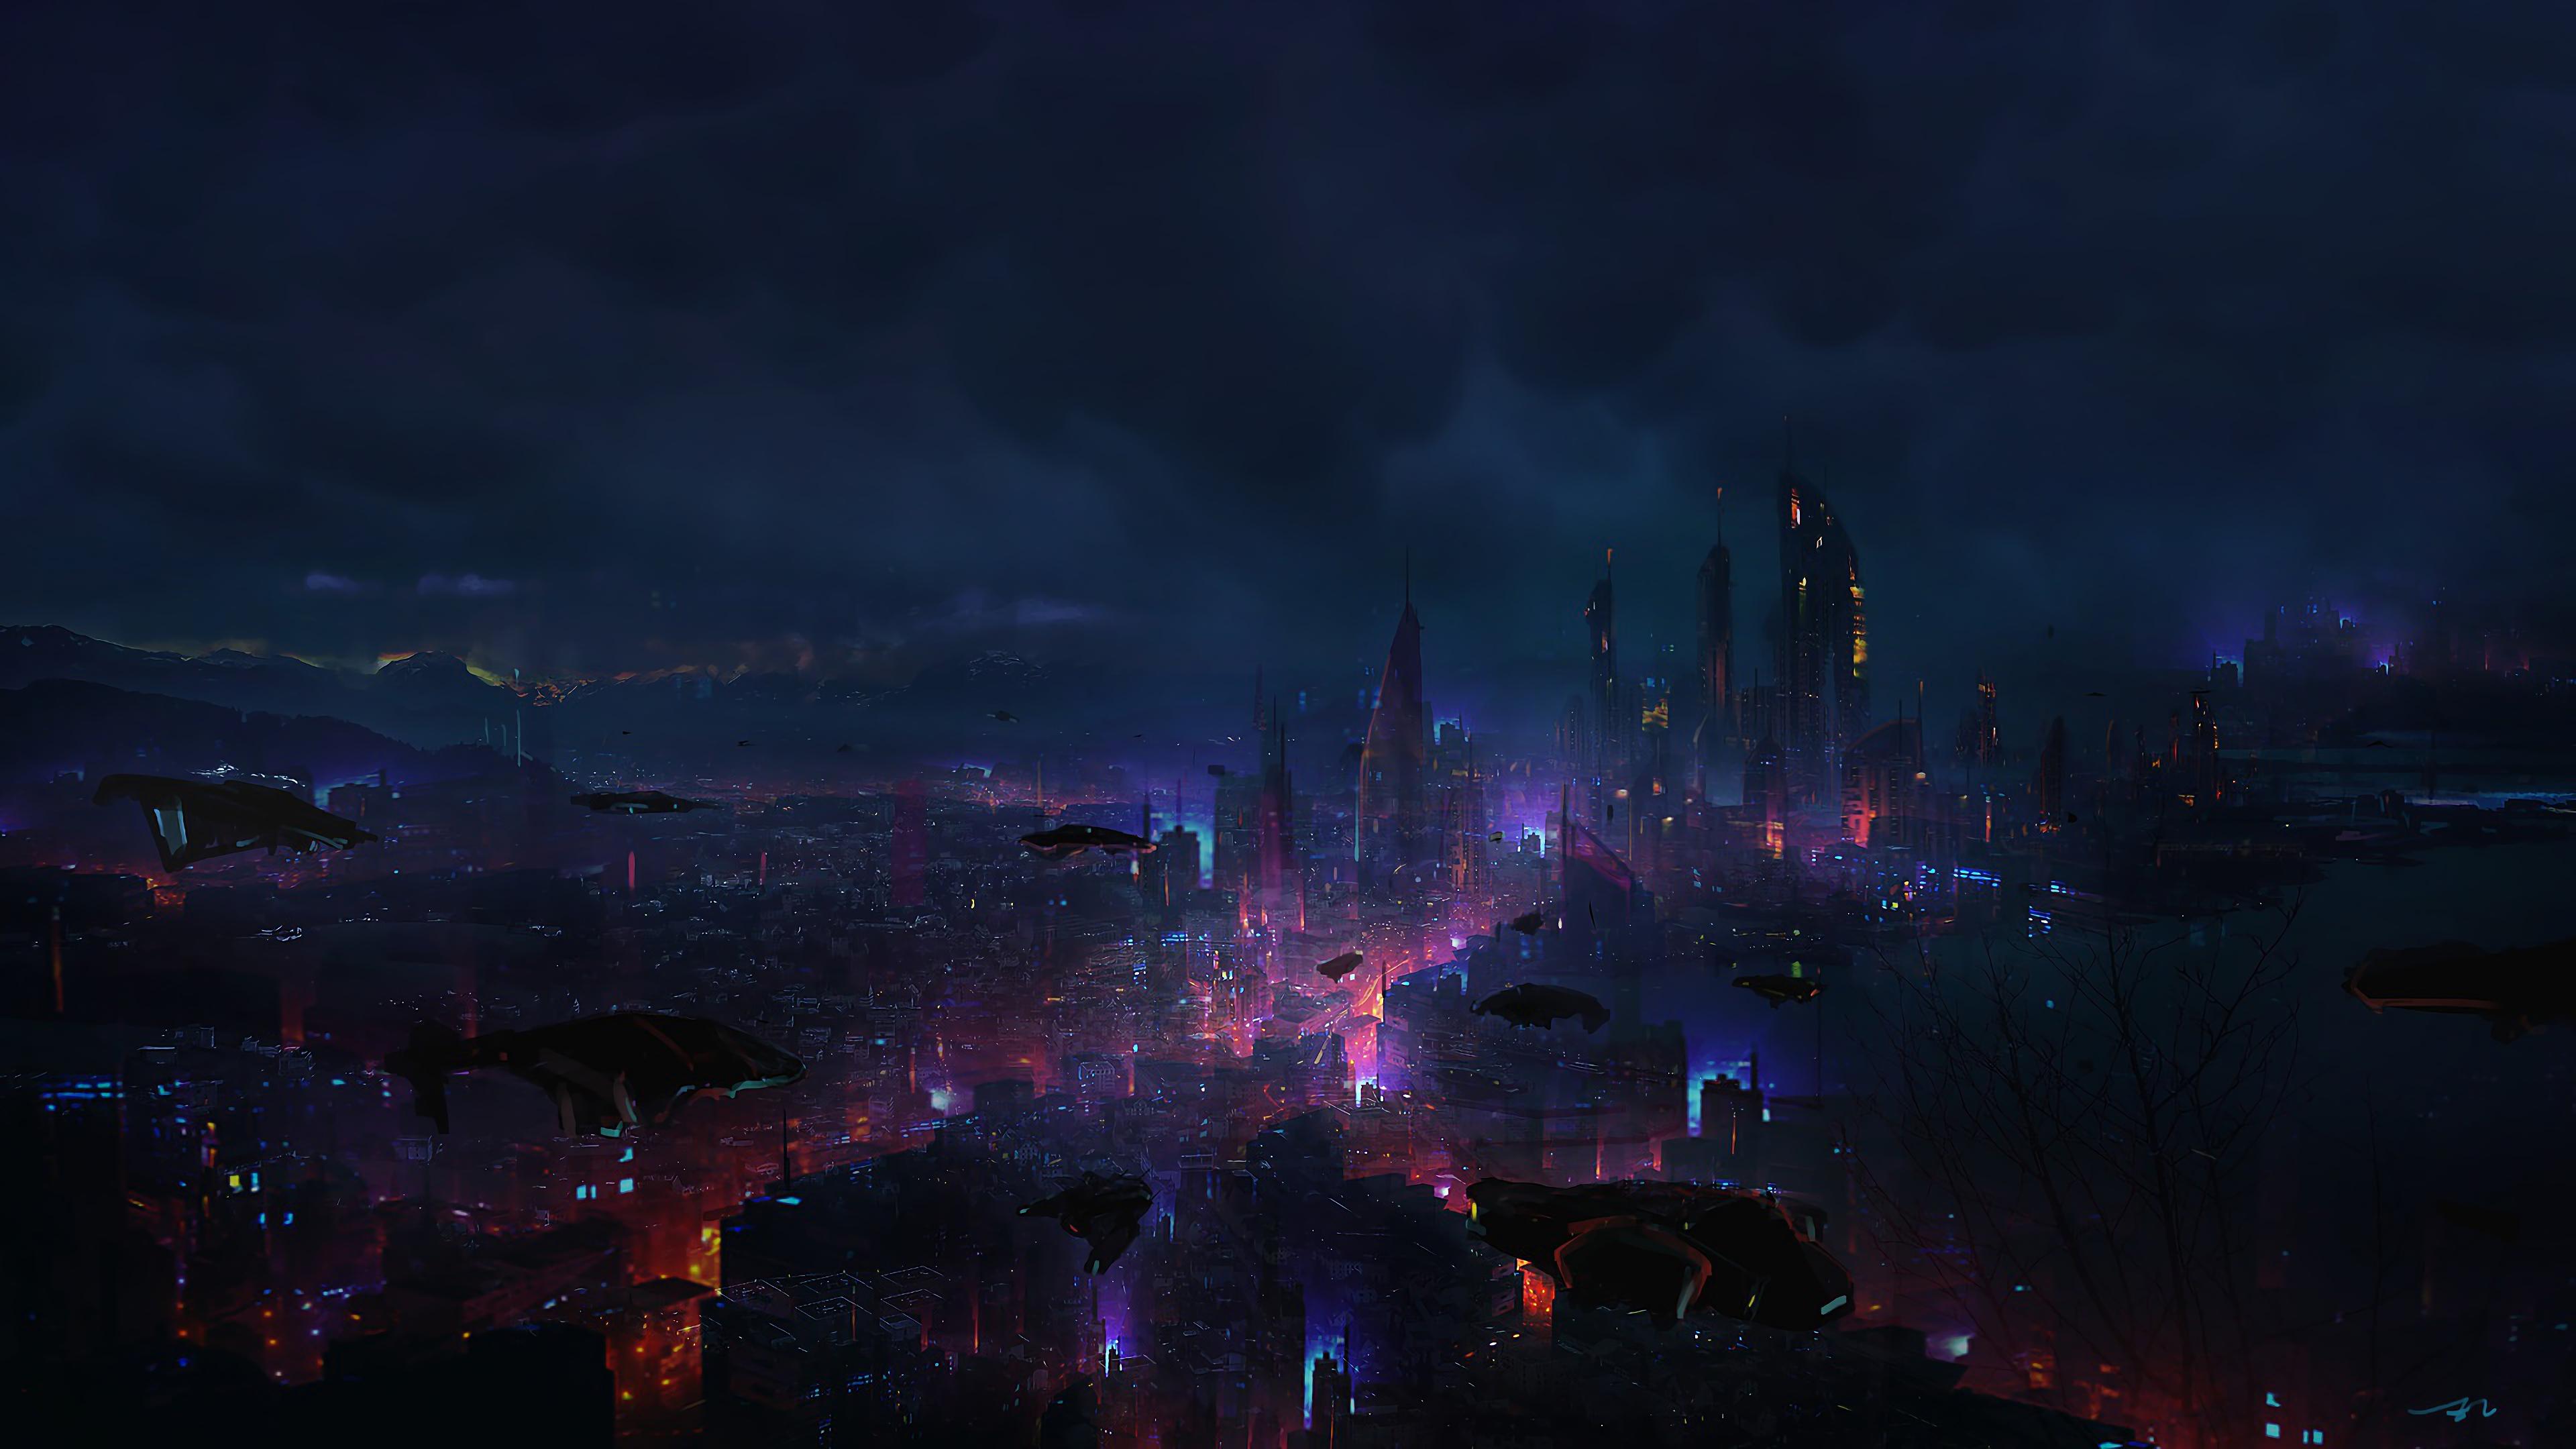 Fall Dual Monitor Wallpaper Cyberpunk City Night Scenery Sci Fi 4k 94 Wallpaper